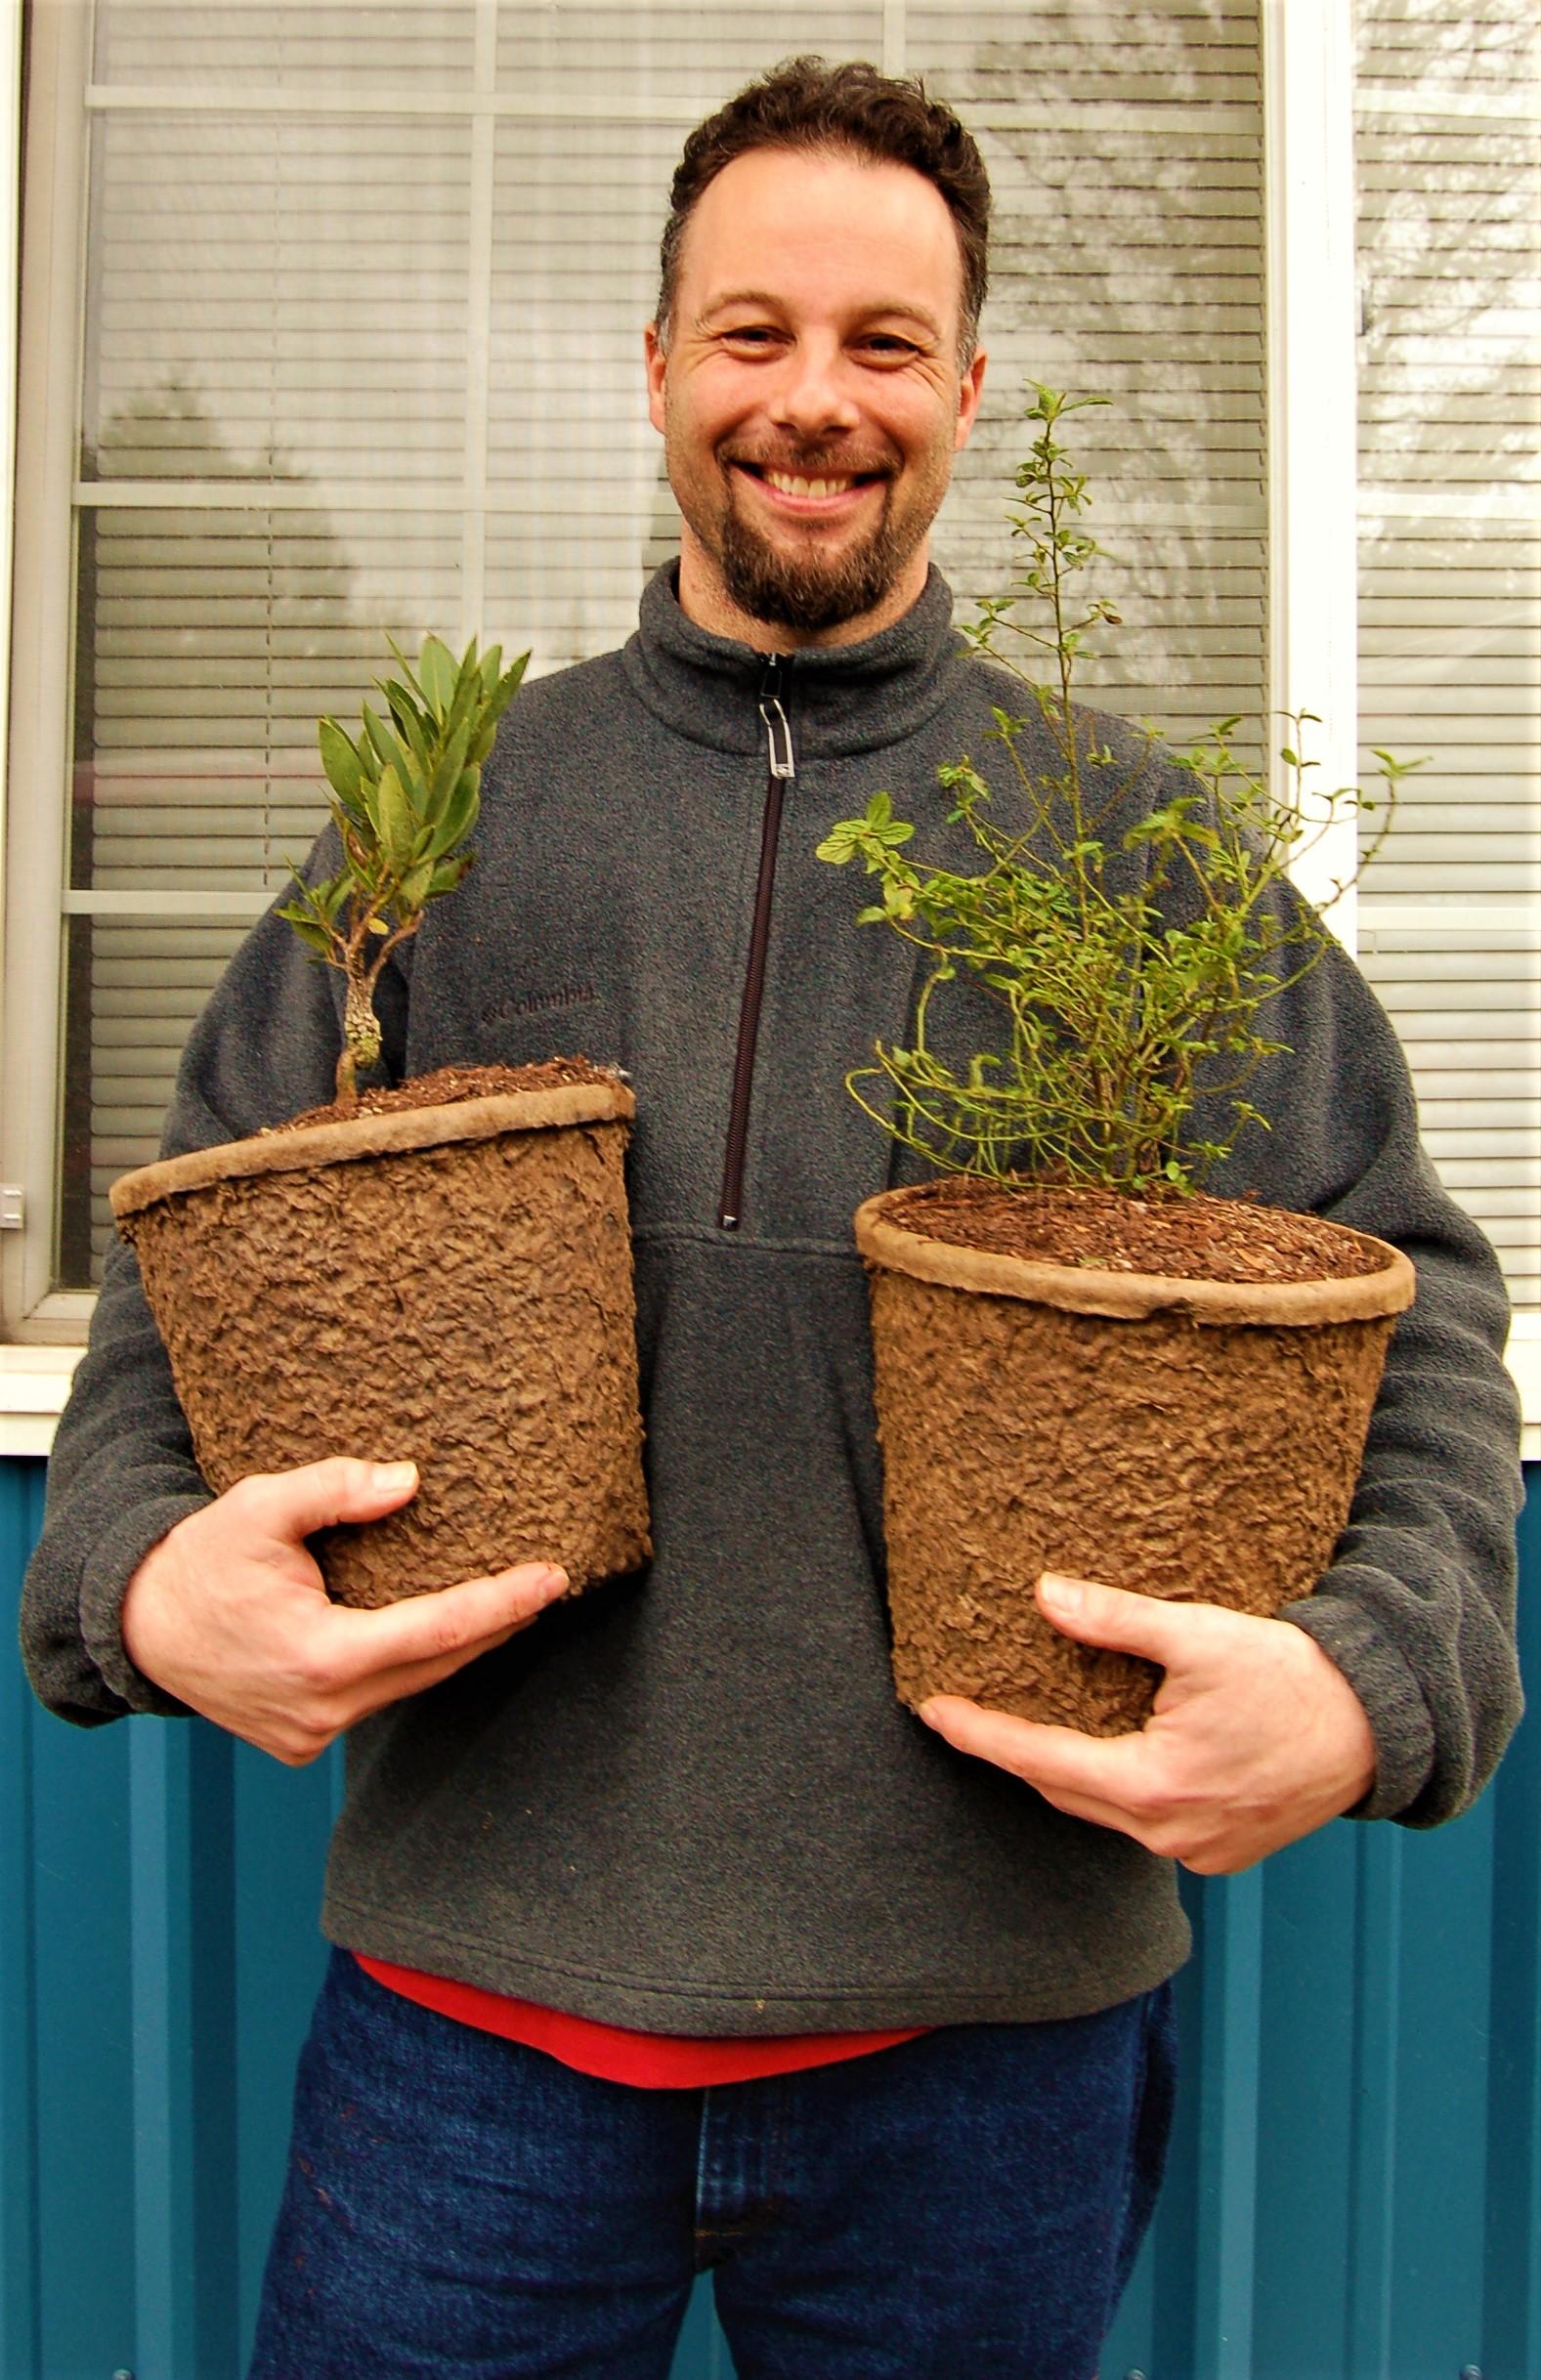 dan-holding-plant.jpg